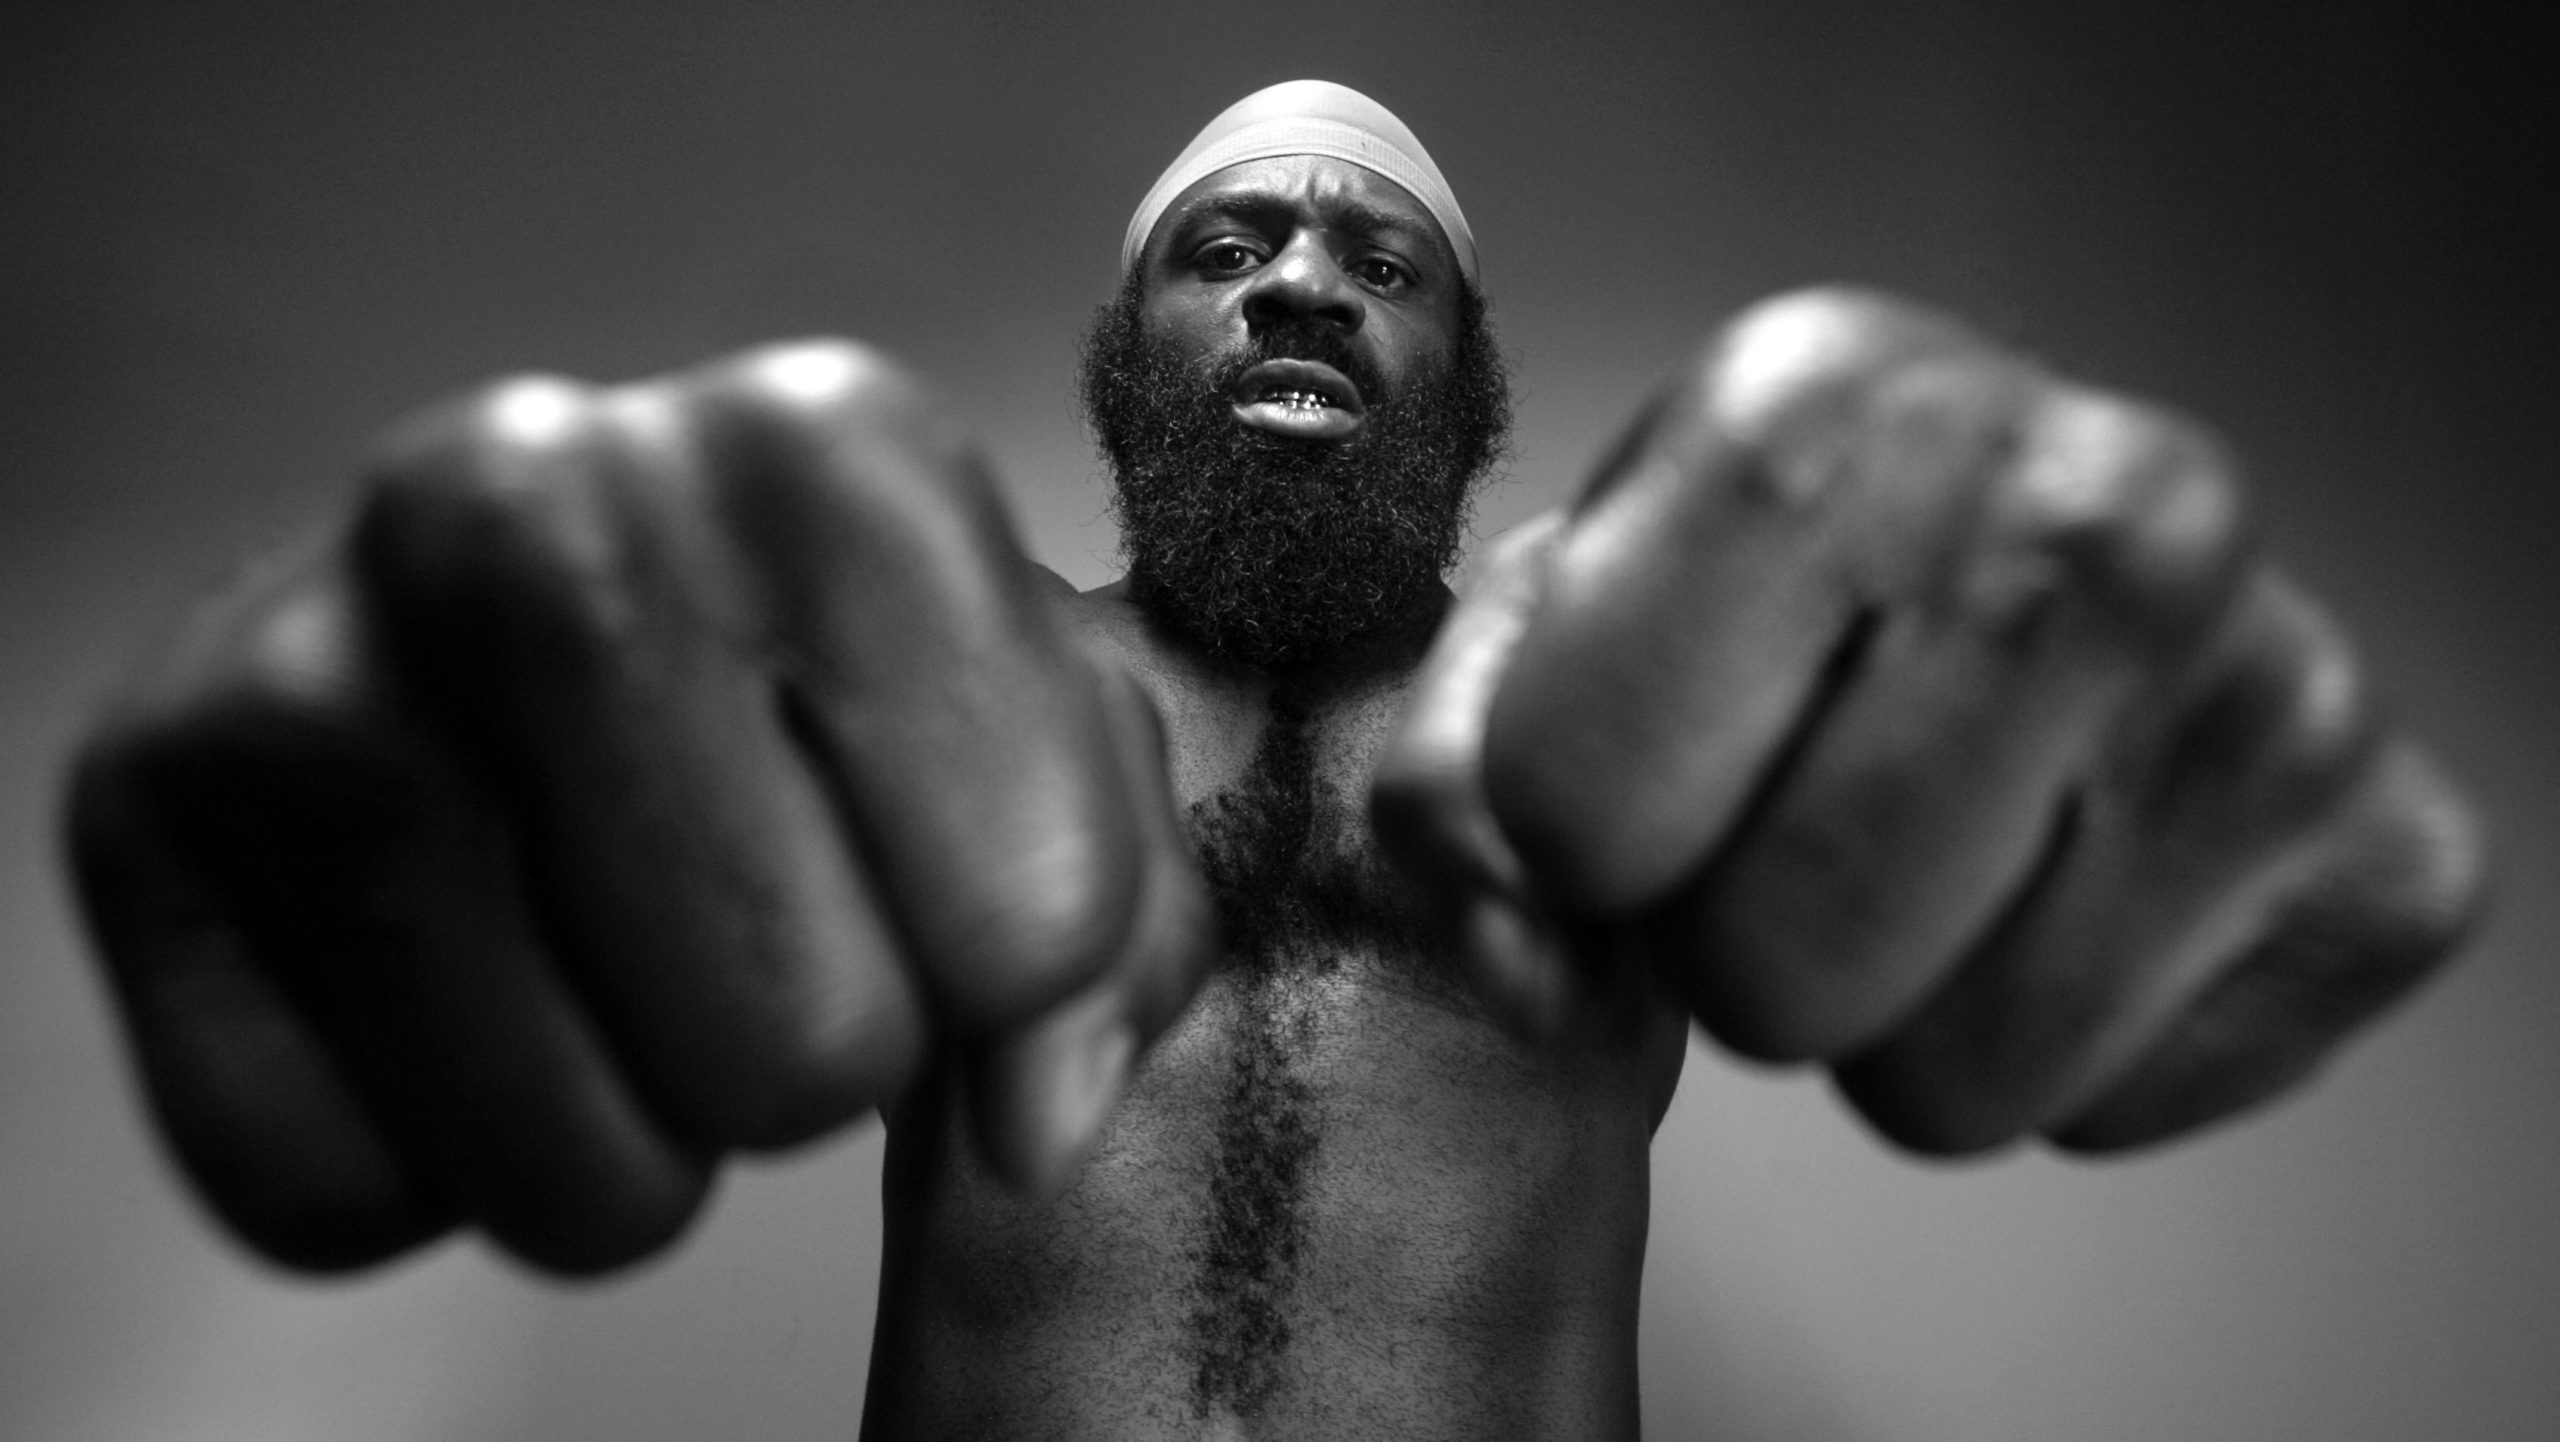 Кимбо Слайс - боец Bellator: биография, статистика, видео боёв